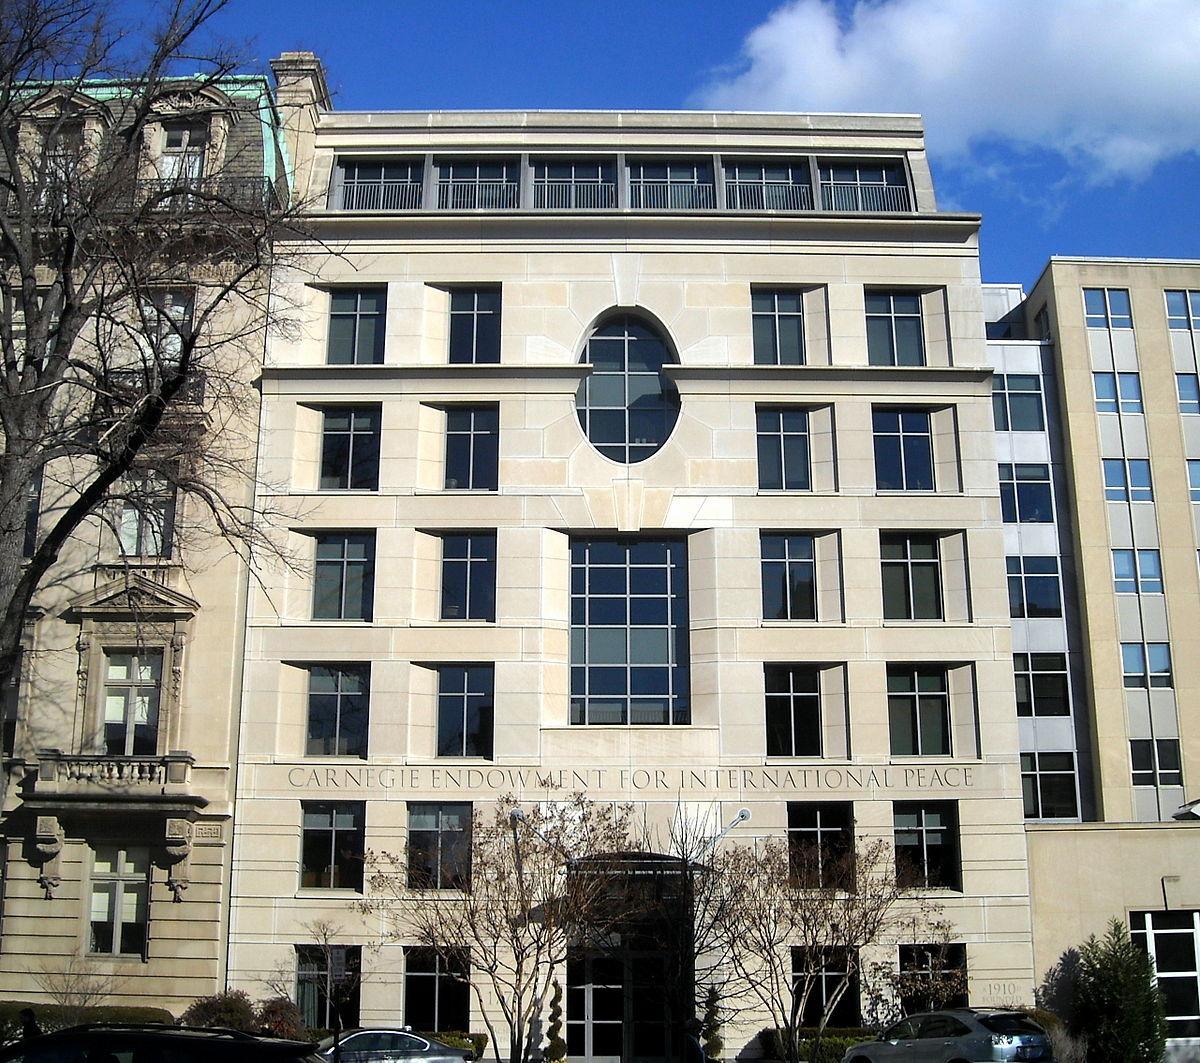 Carnegie Endowment for International Peace  Wikipedia